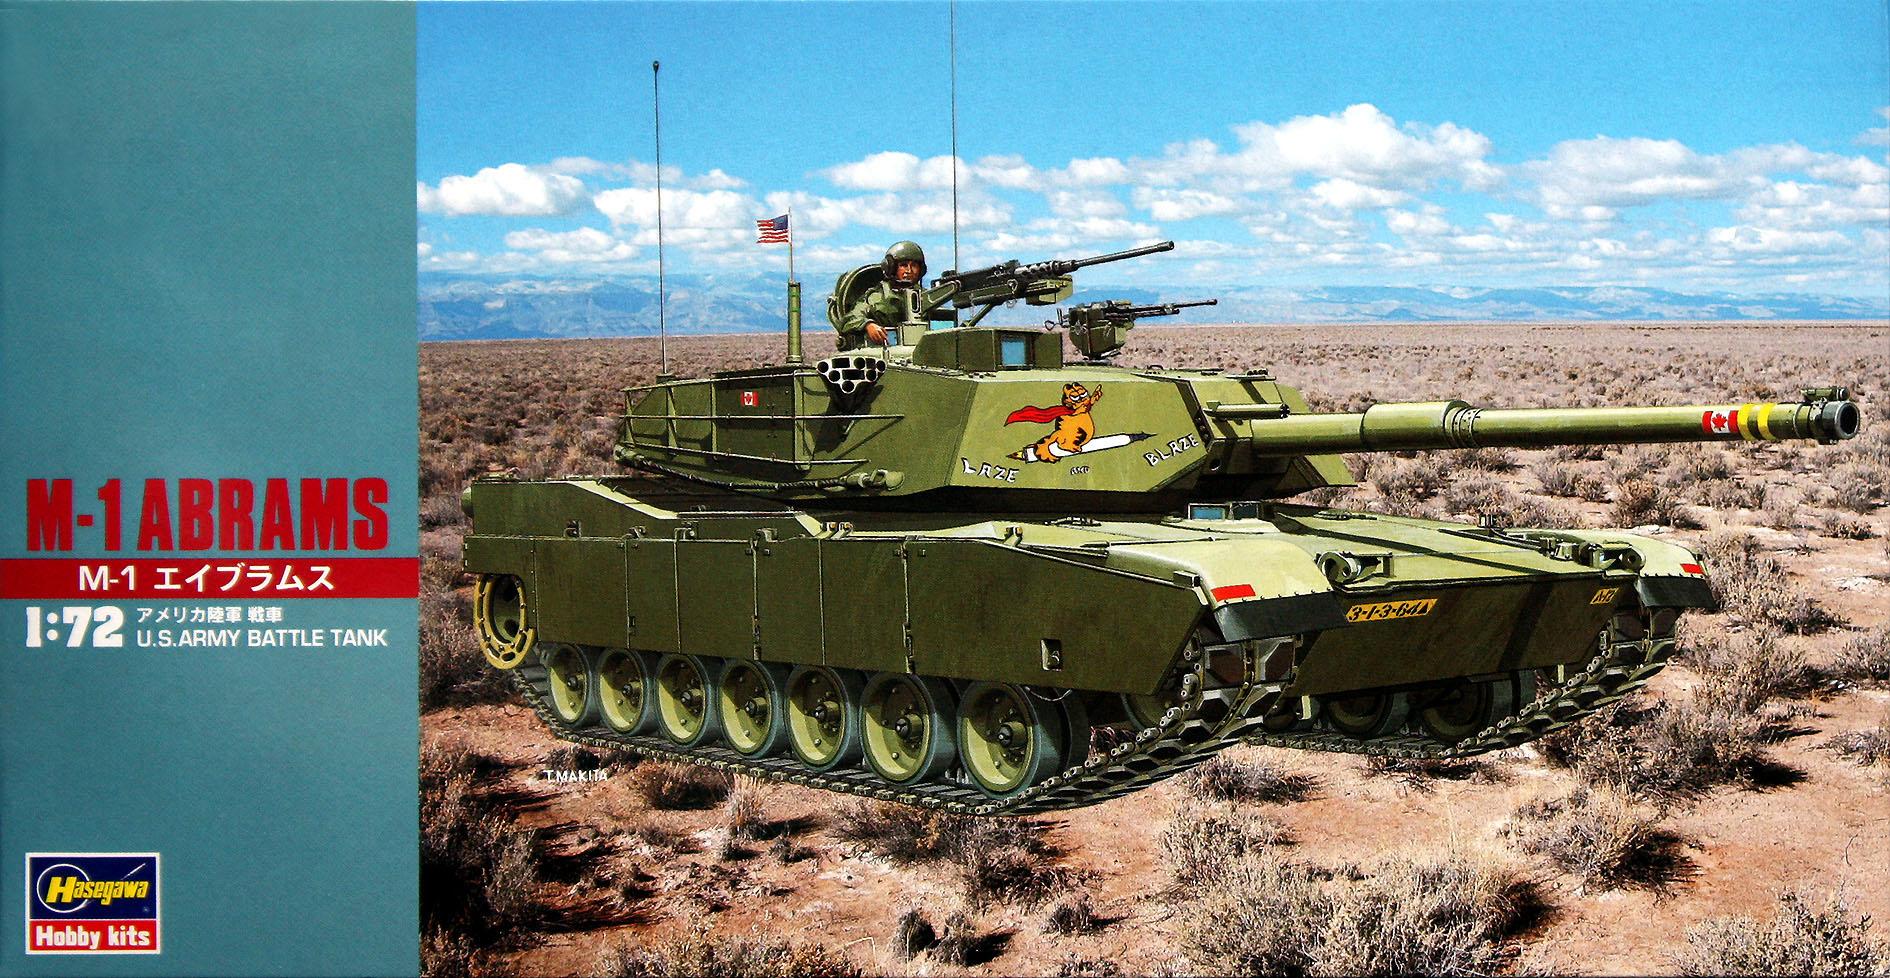 Hasegawa 1/72 M-1 Abrams